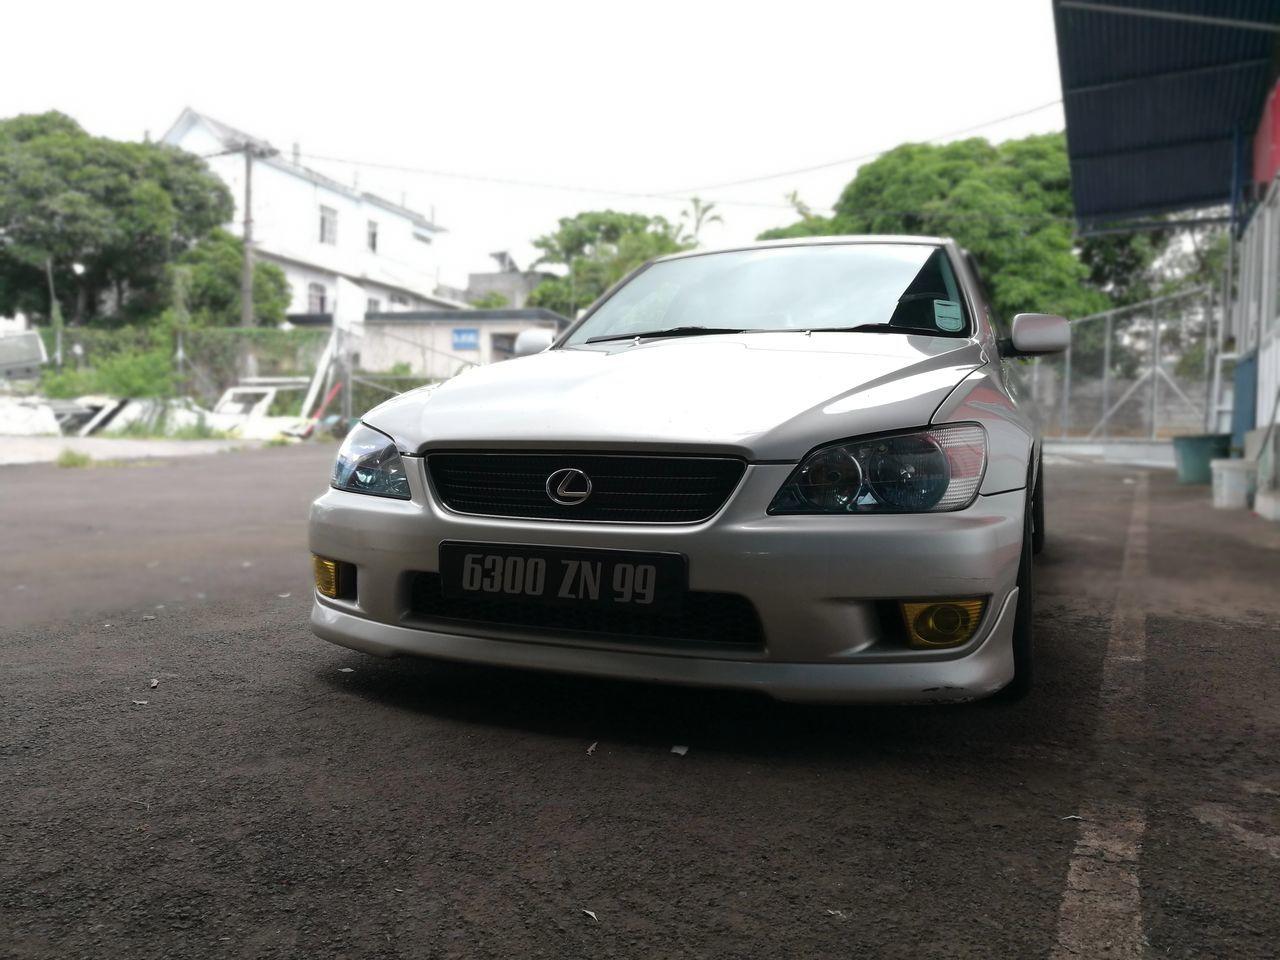 Lexus Is300 Lexus Is200 Loweredlifestyle First Eyeem Photo